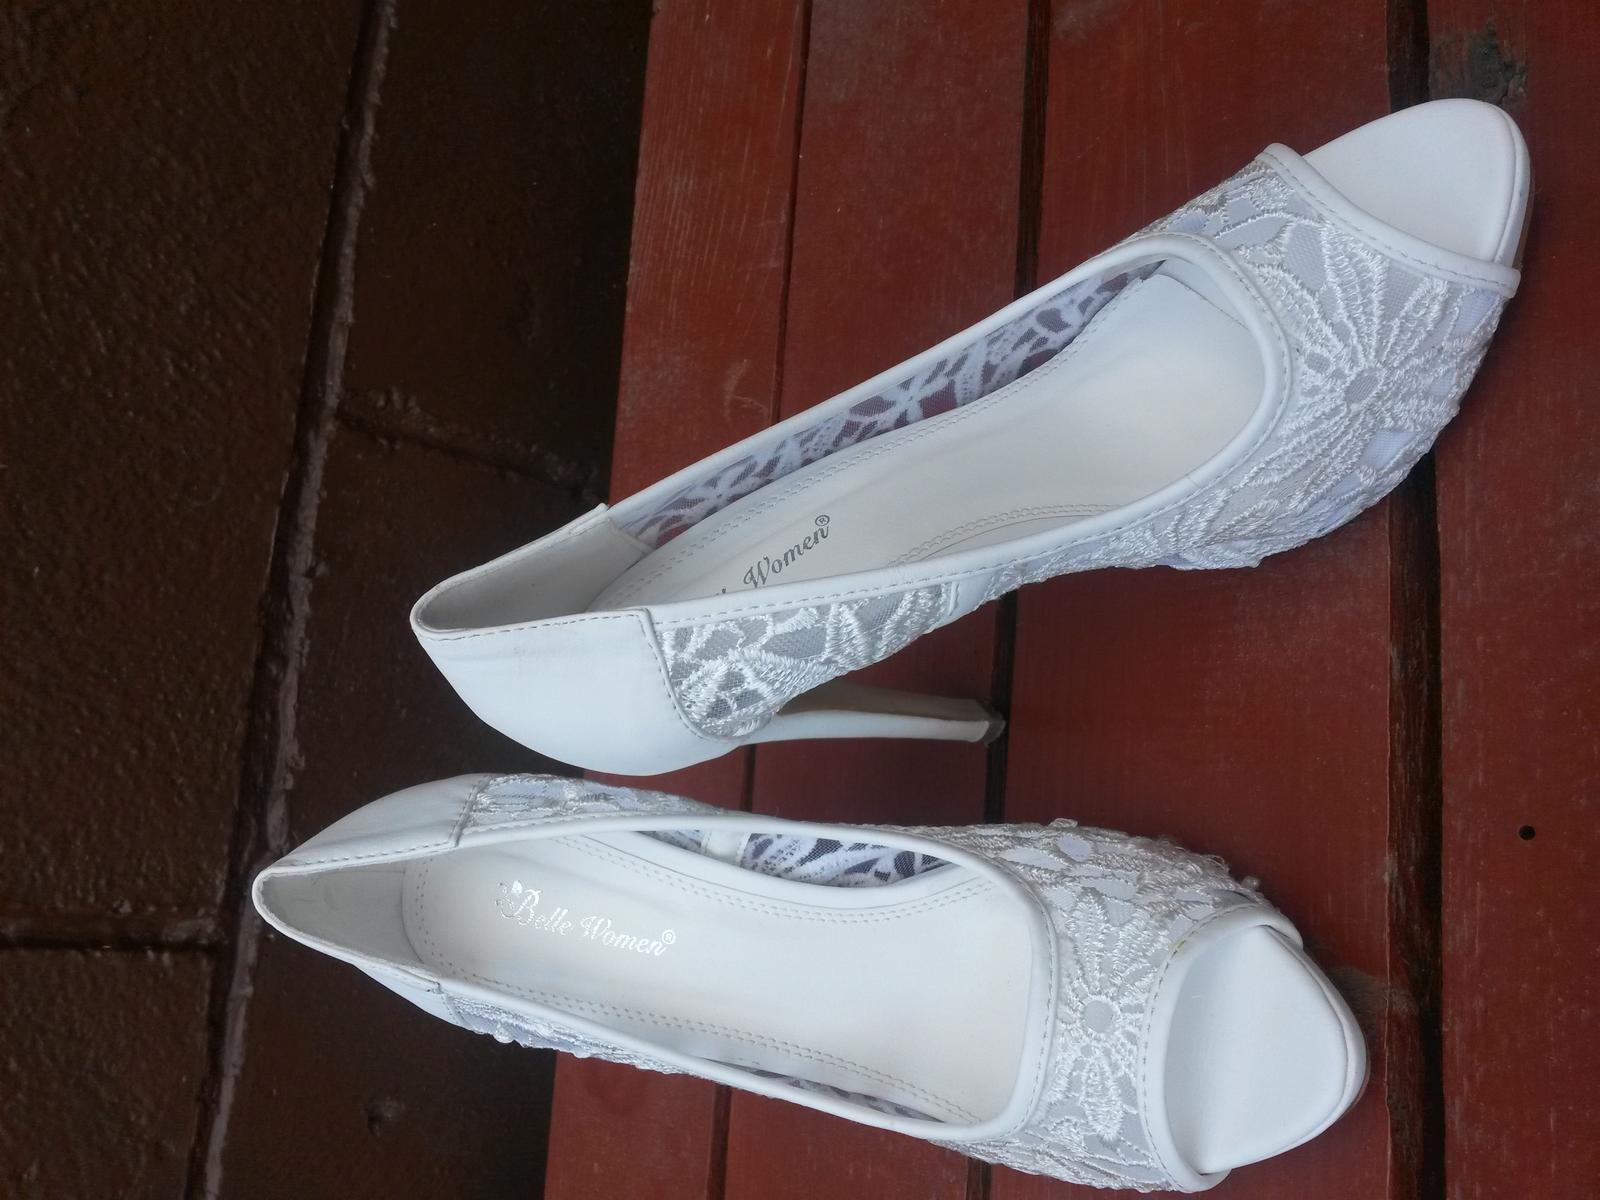 ccb04edd970c Cipkovane svadobne topanky